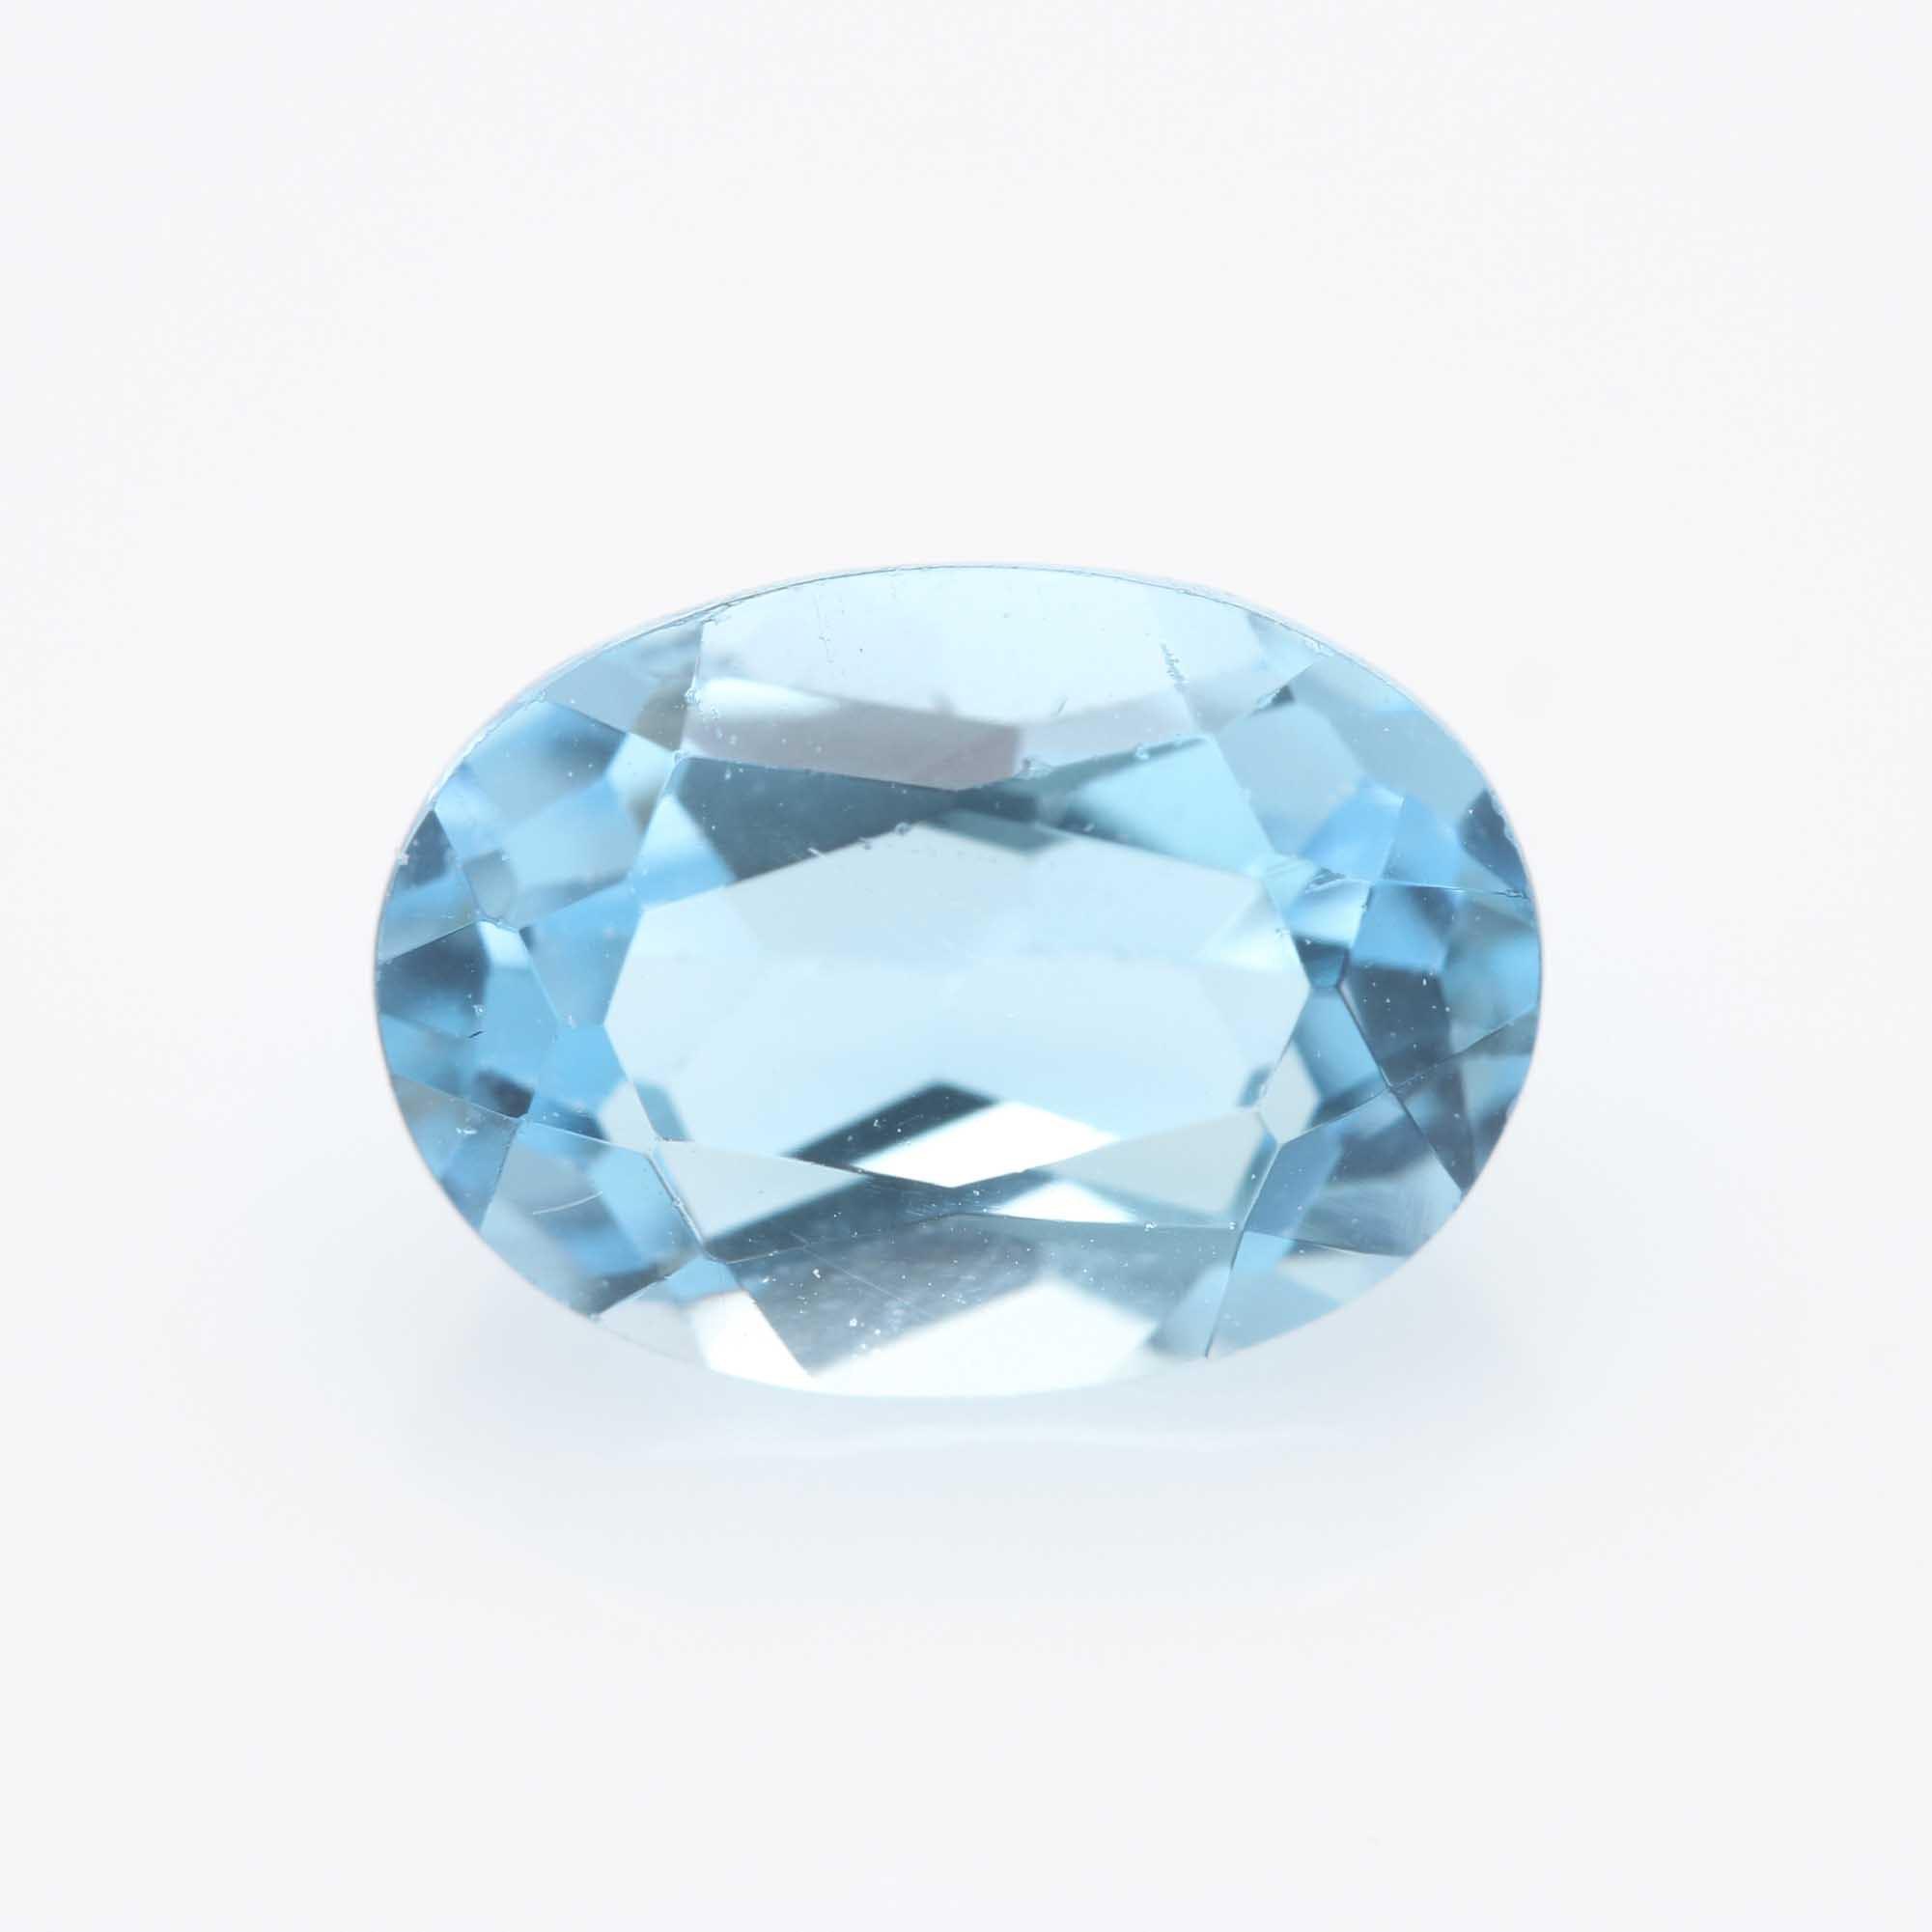 Oval Blue Topaz Stone